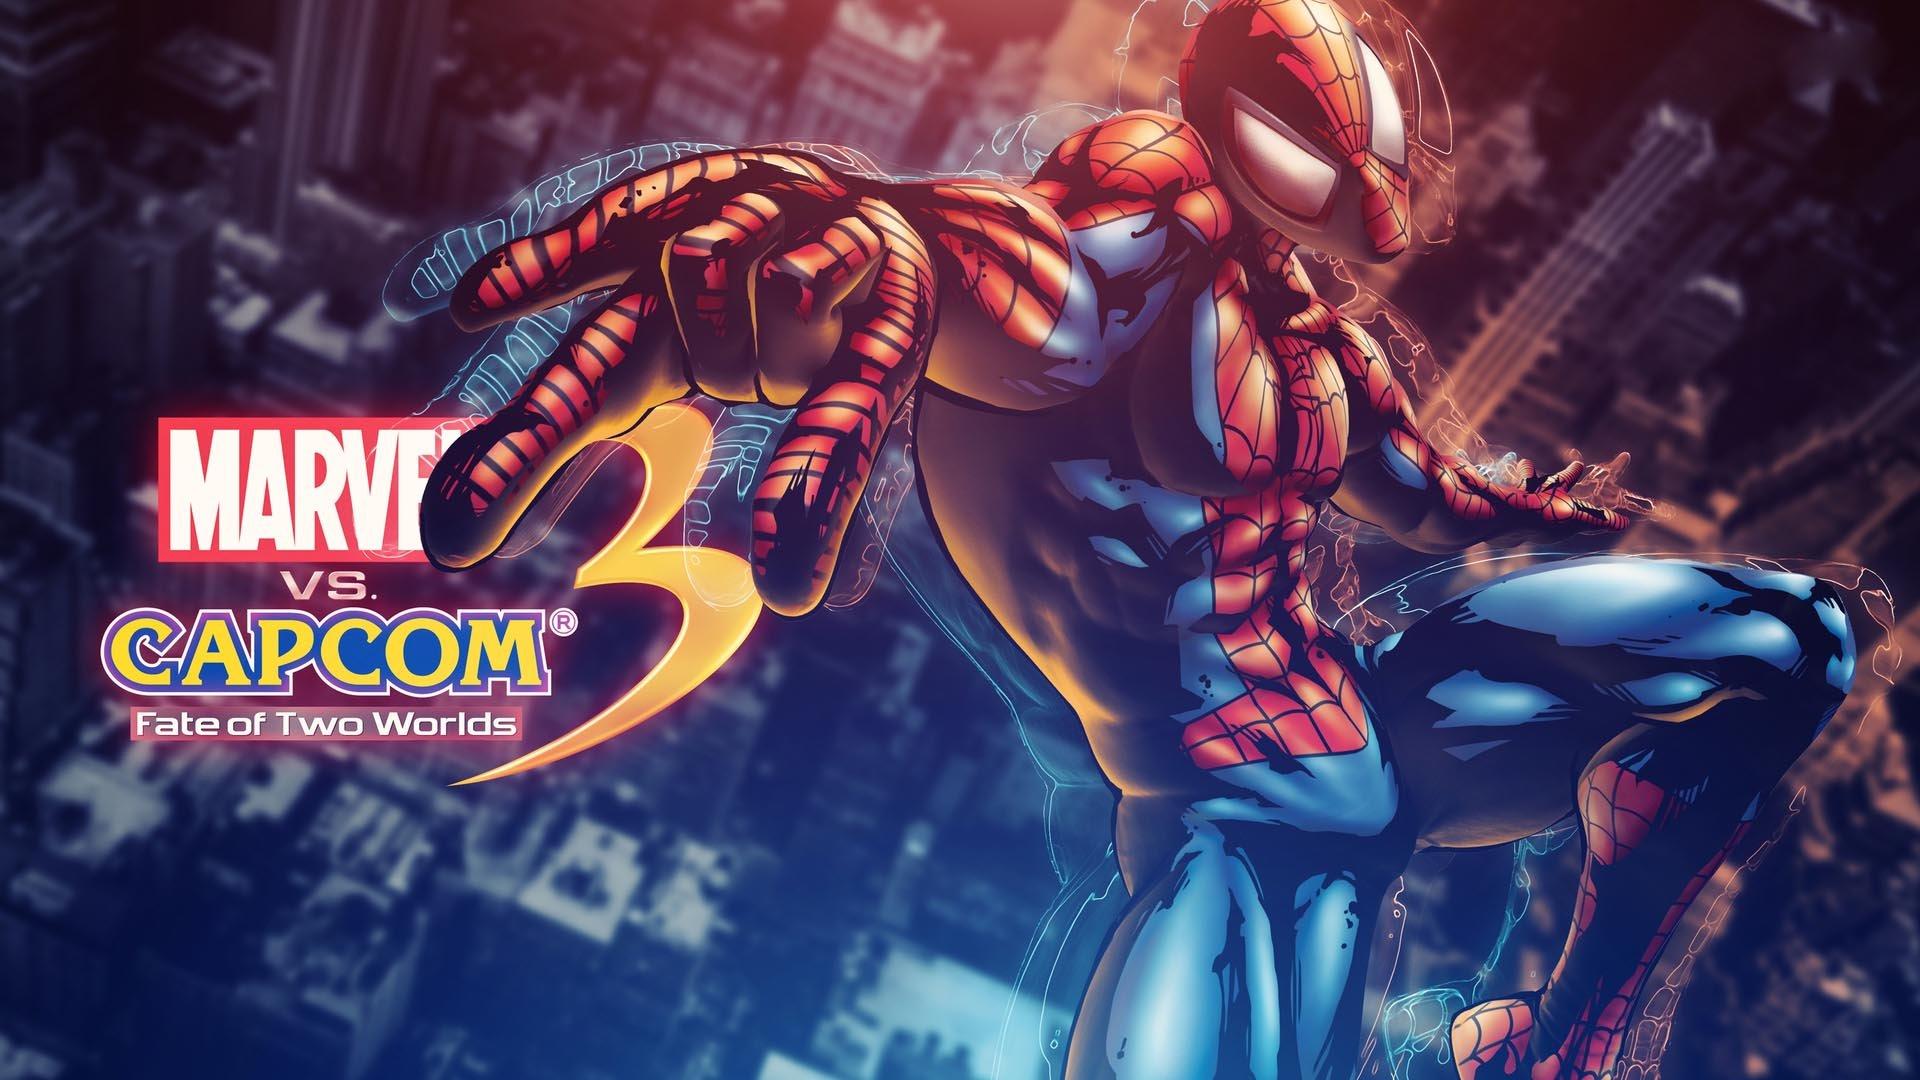 Marvel Vs Capcom 3 Theme For Windows 10 8 7